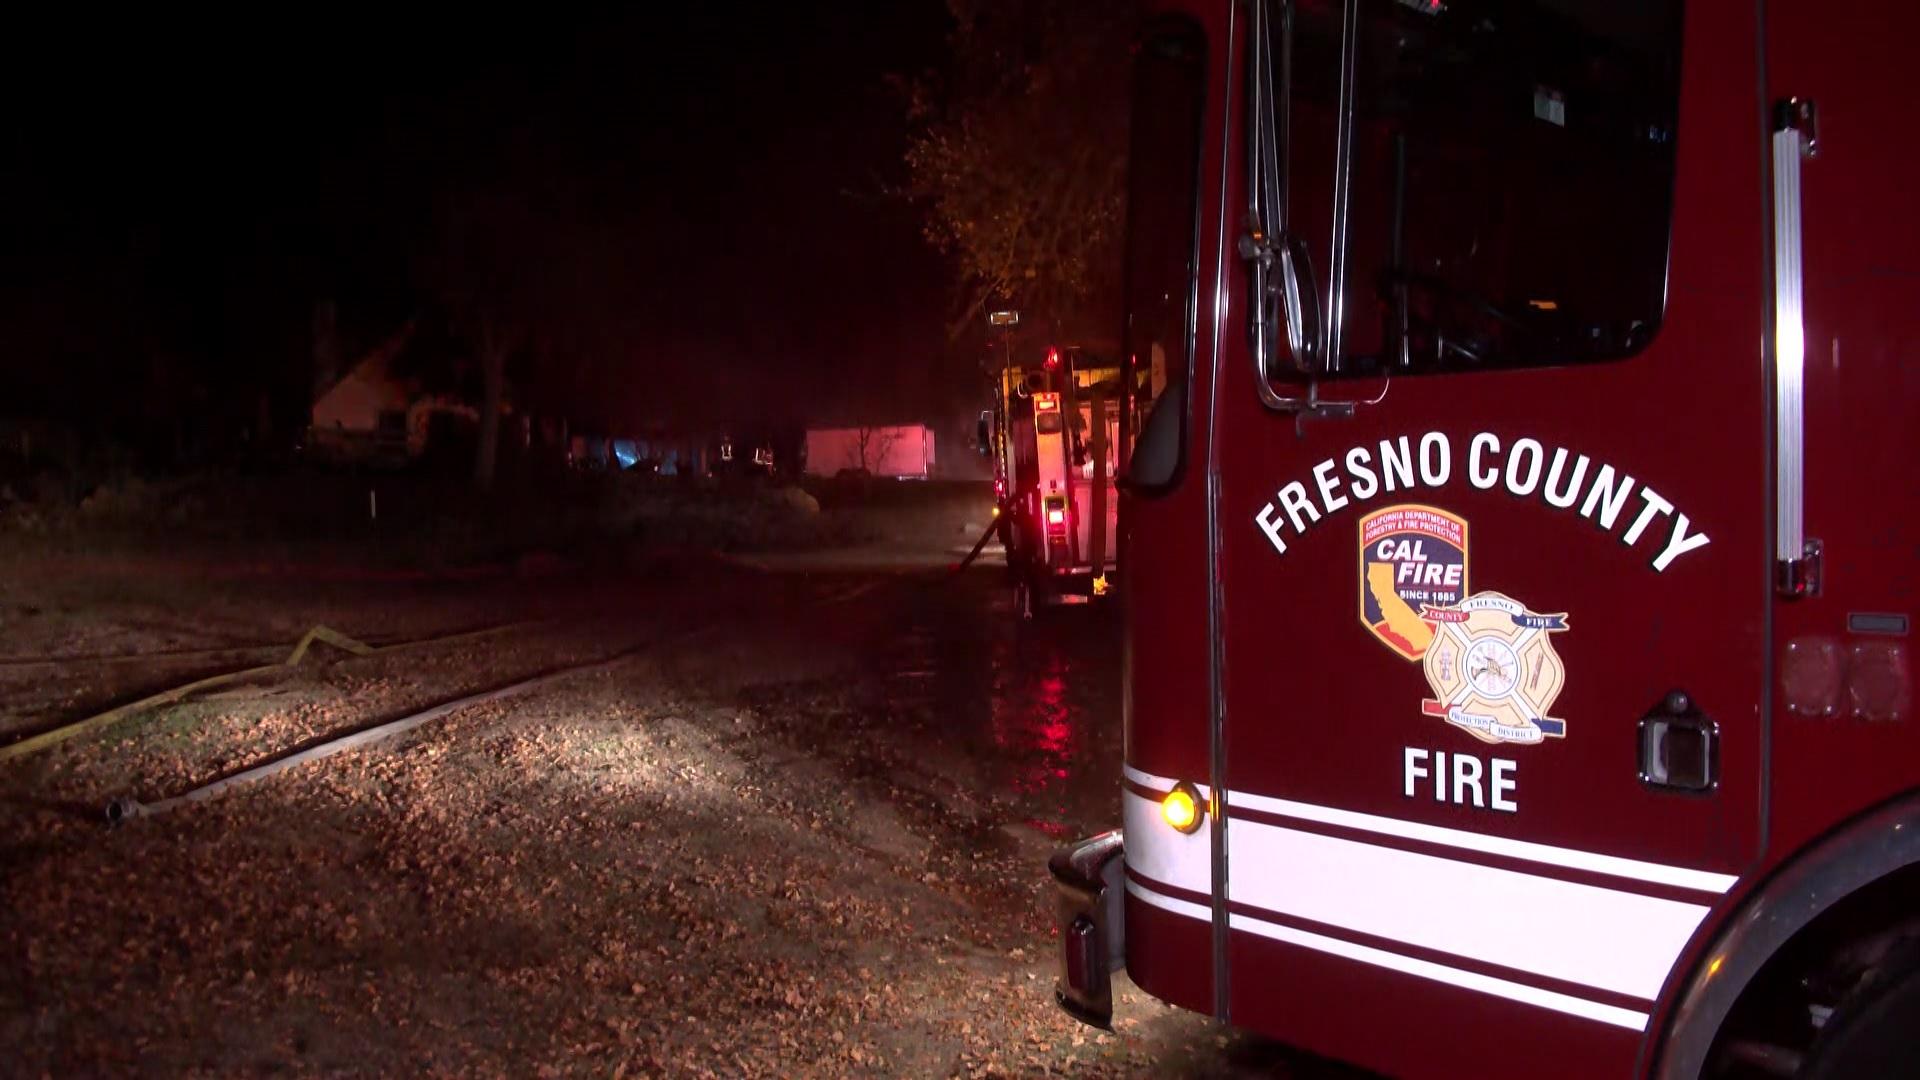 Fire destroys Fresno County garage, crews save owner's home